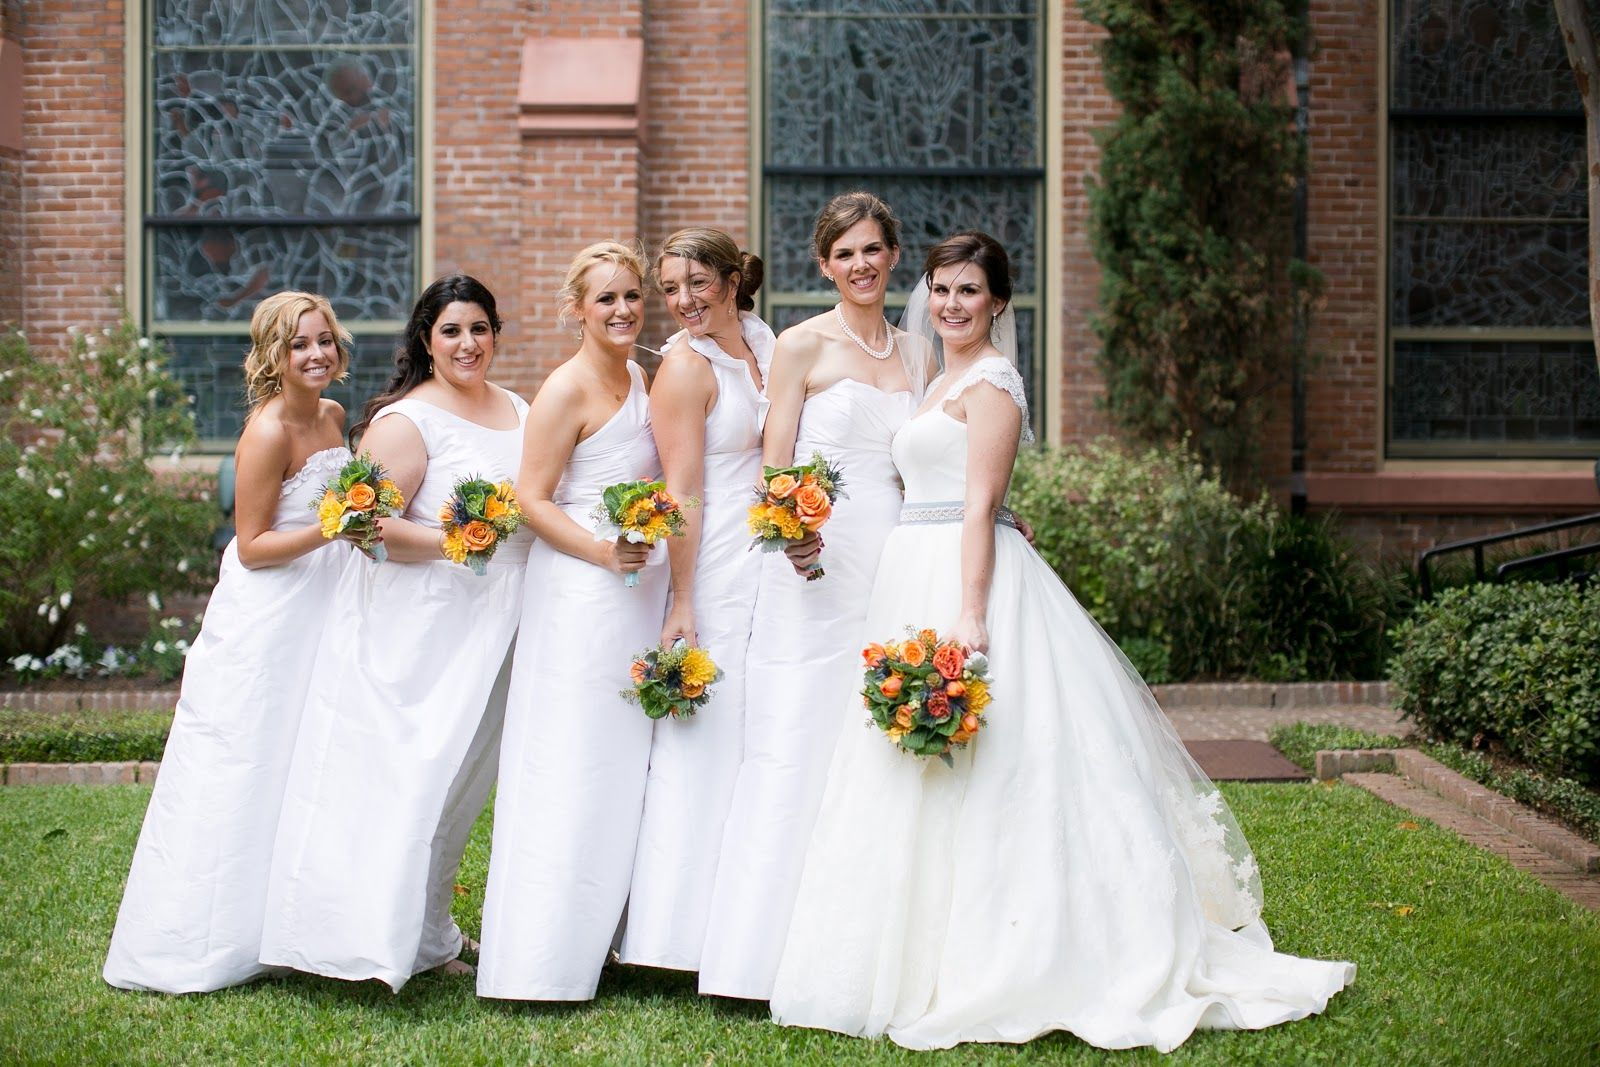 White bridesmaid dresses dressed up girl bridesmaid dresses white bridesmaid dresses dressed up girl ombrellifo Images